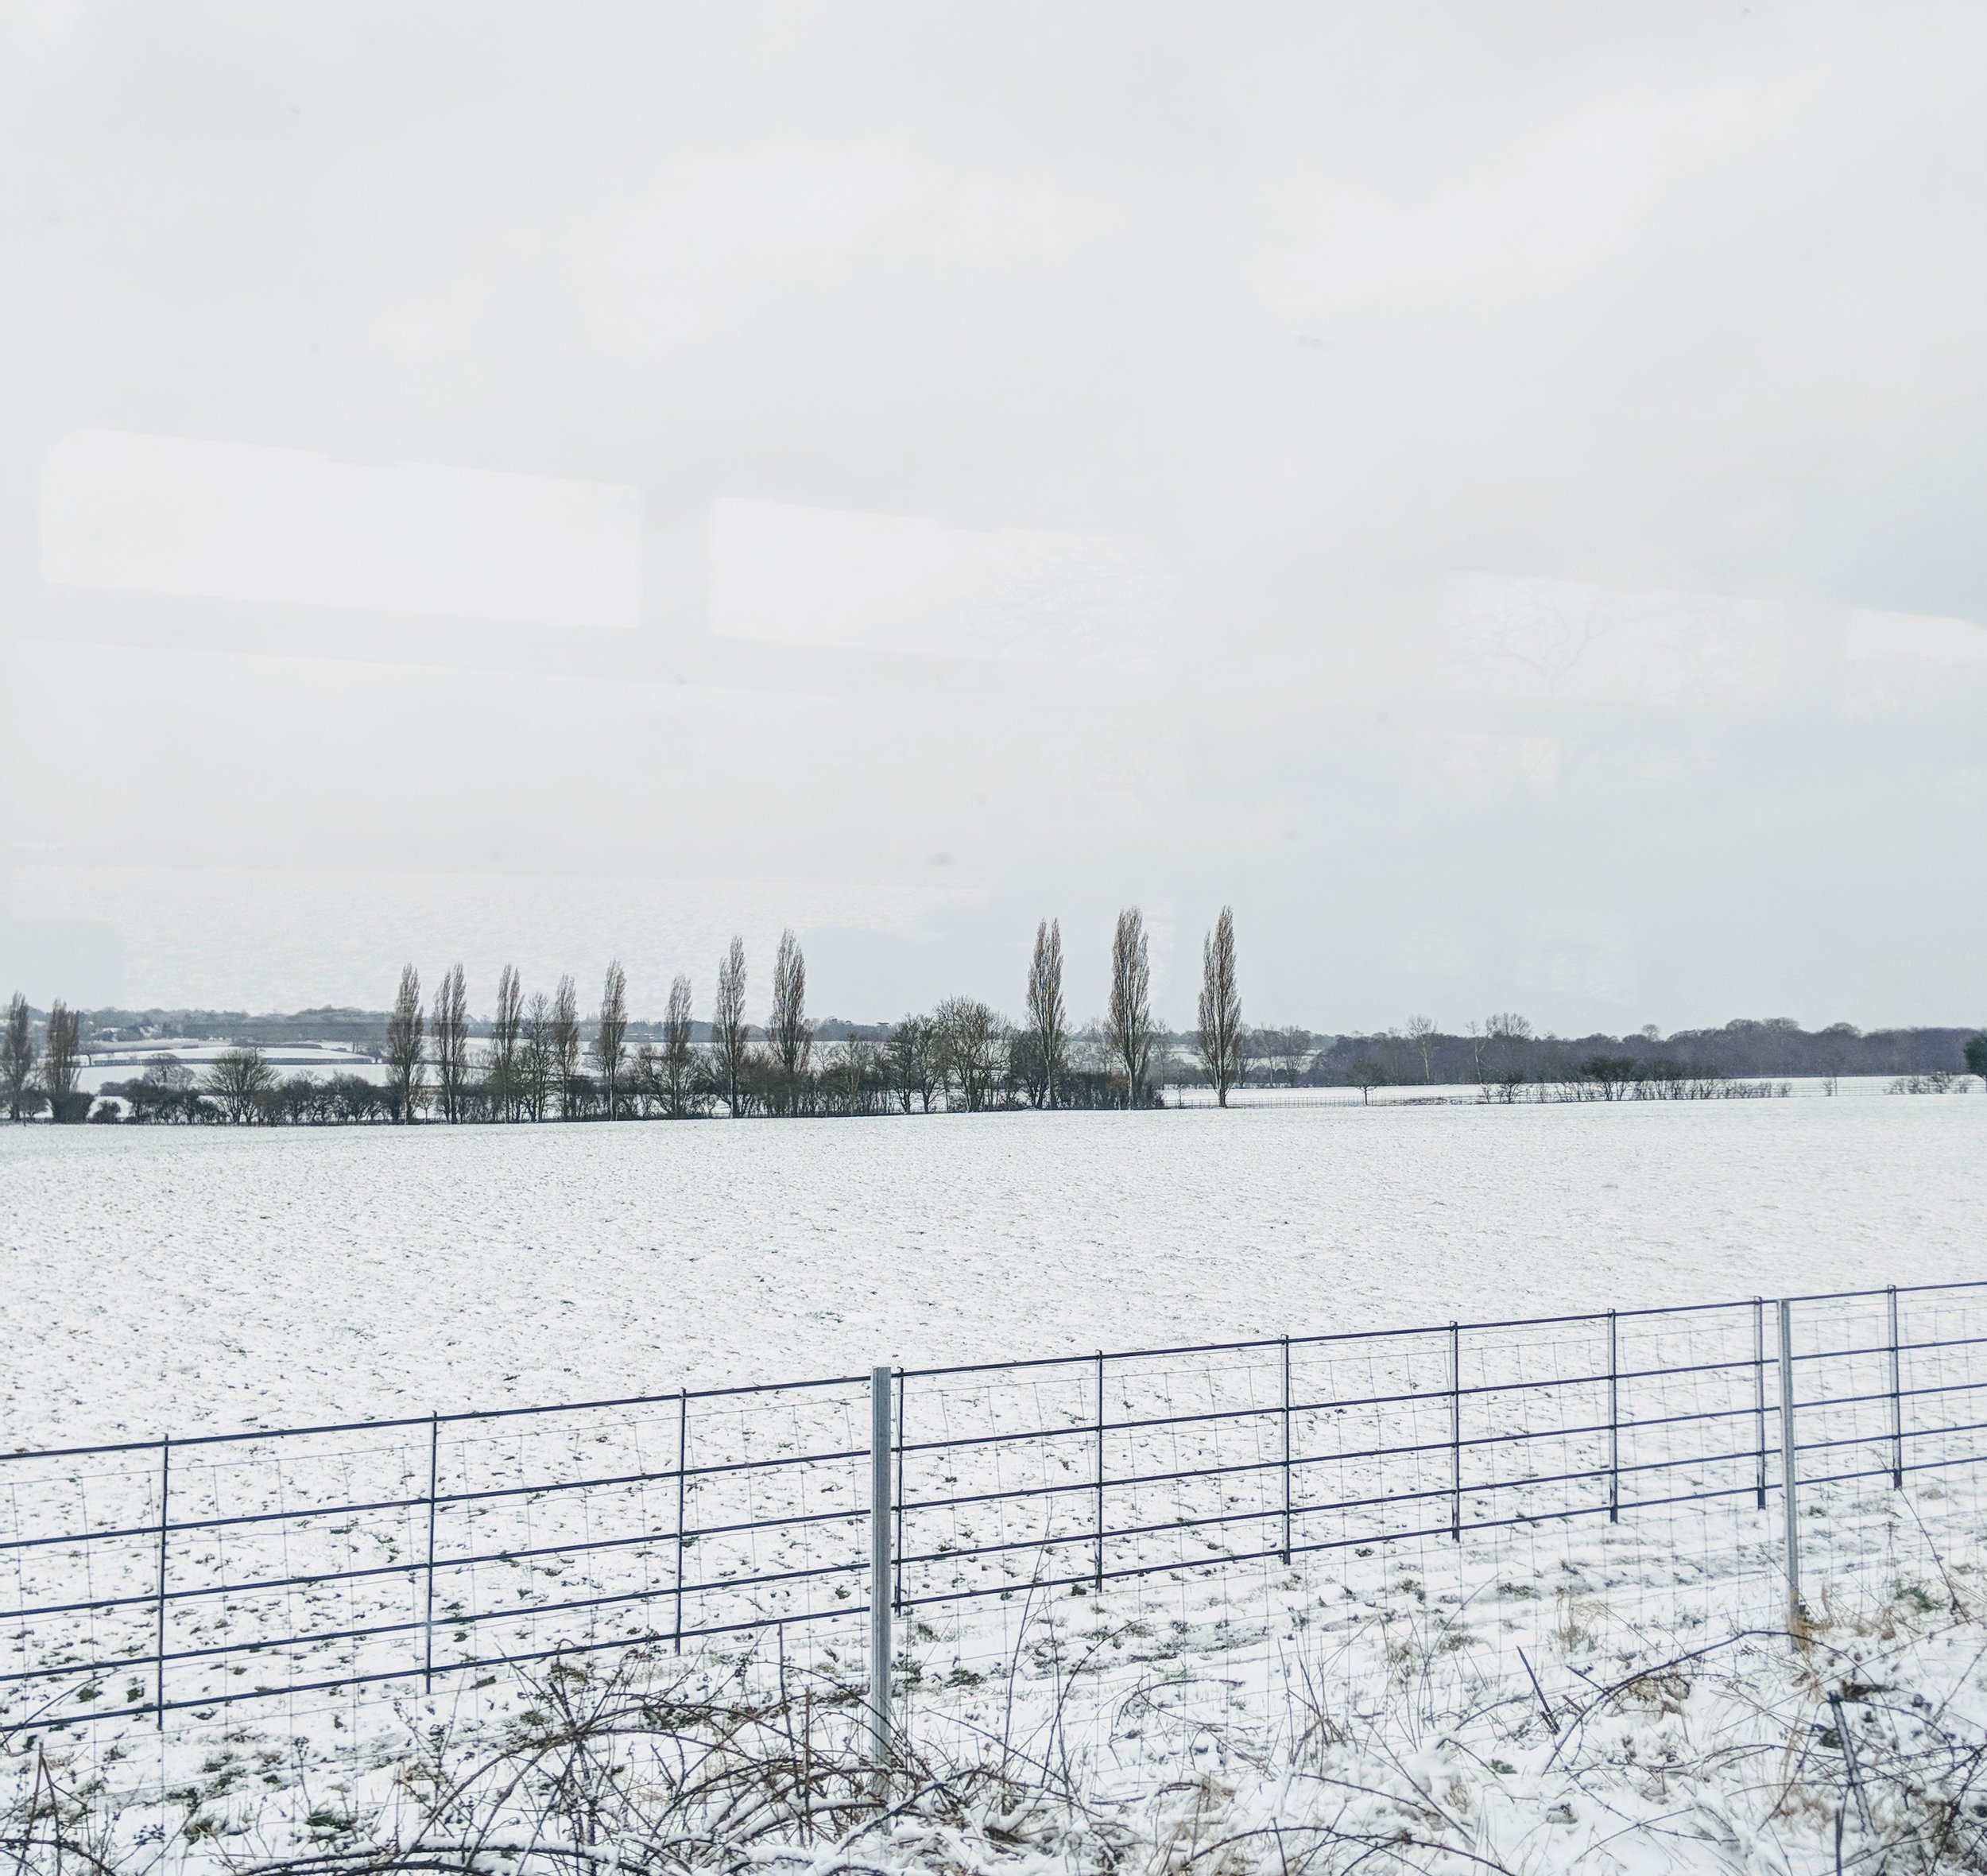 Snowy Day in Chelmsford